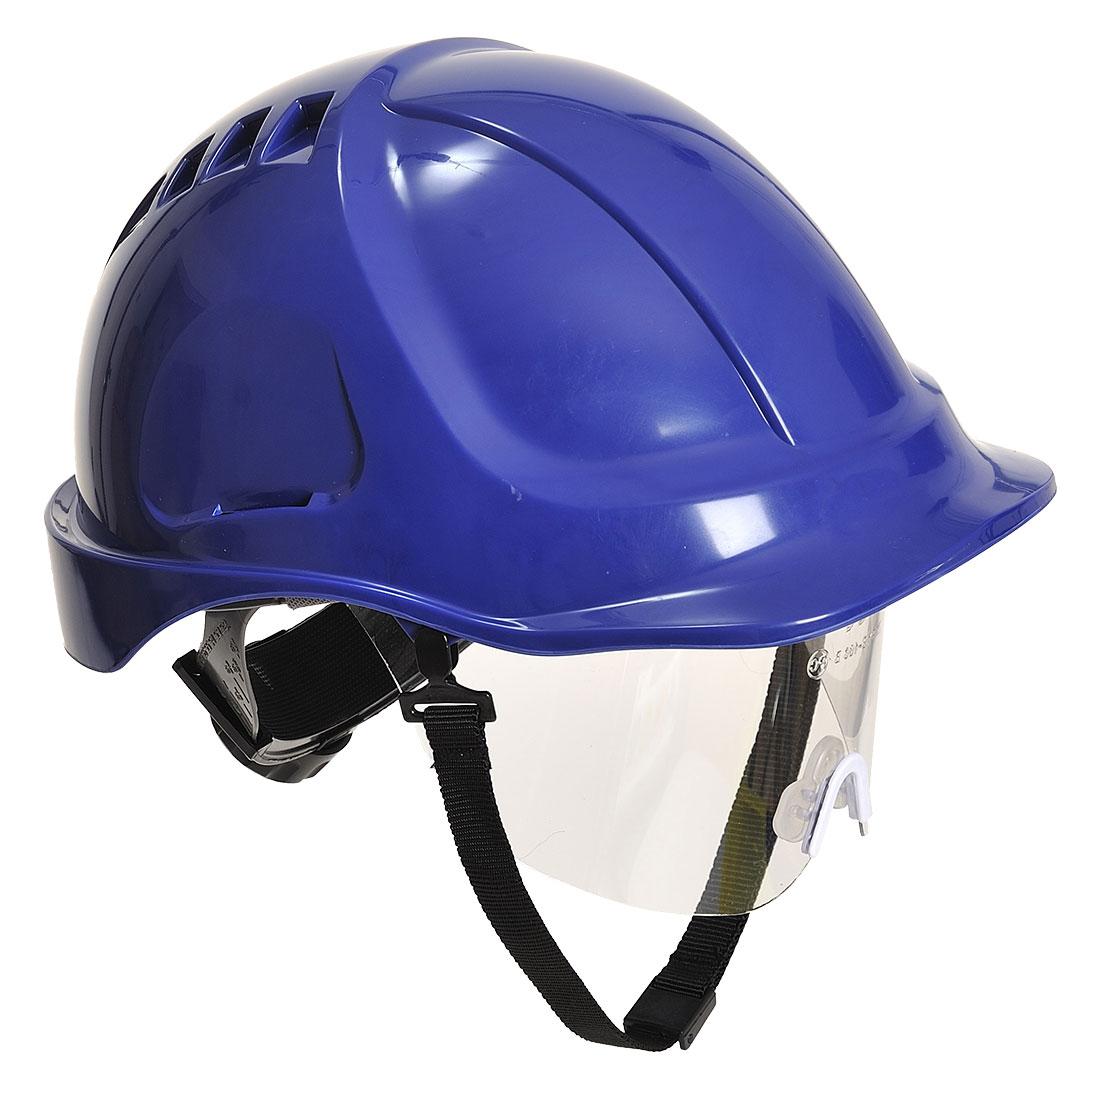 Endurance Plus Helmet (MM) Royal Blue